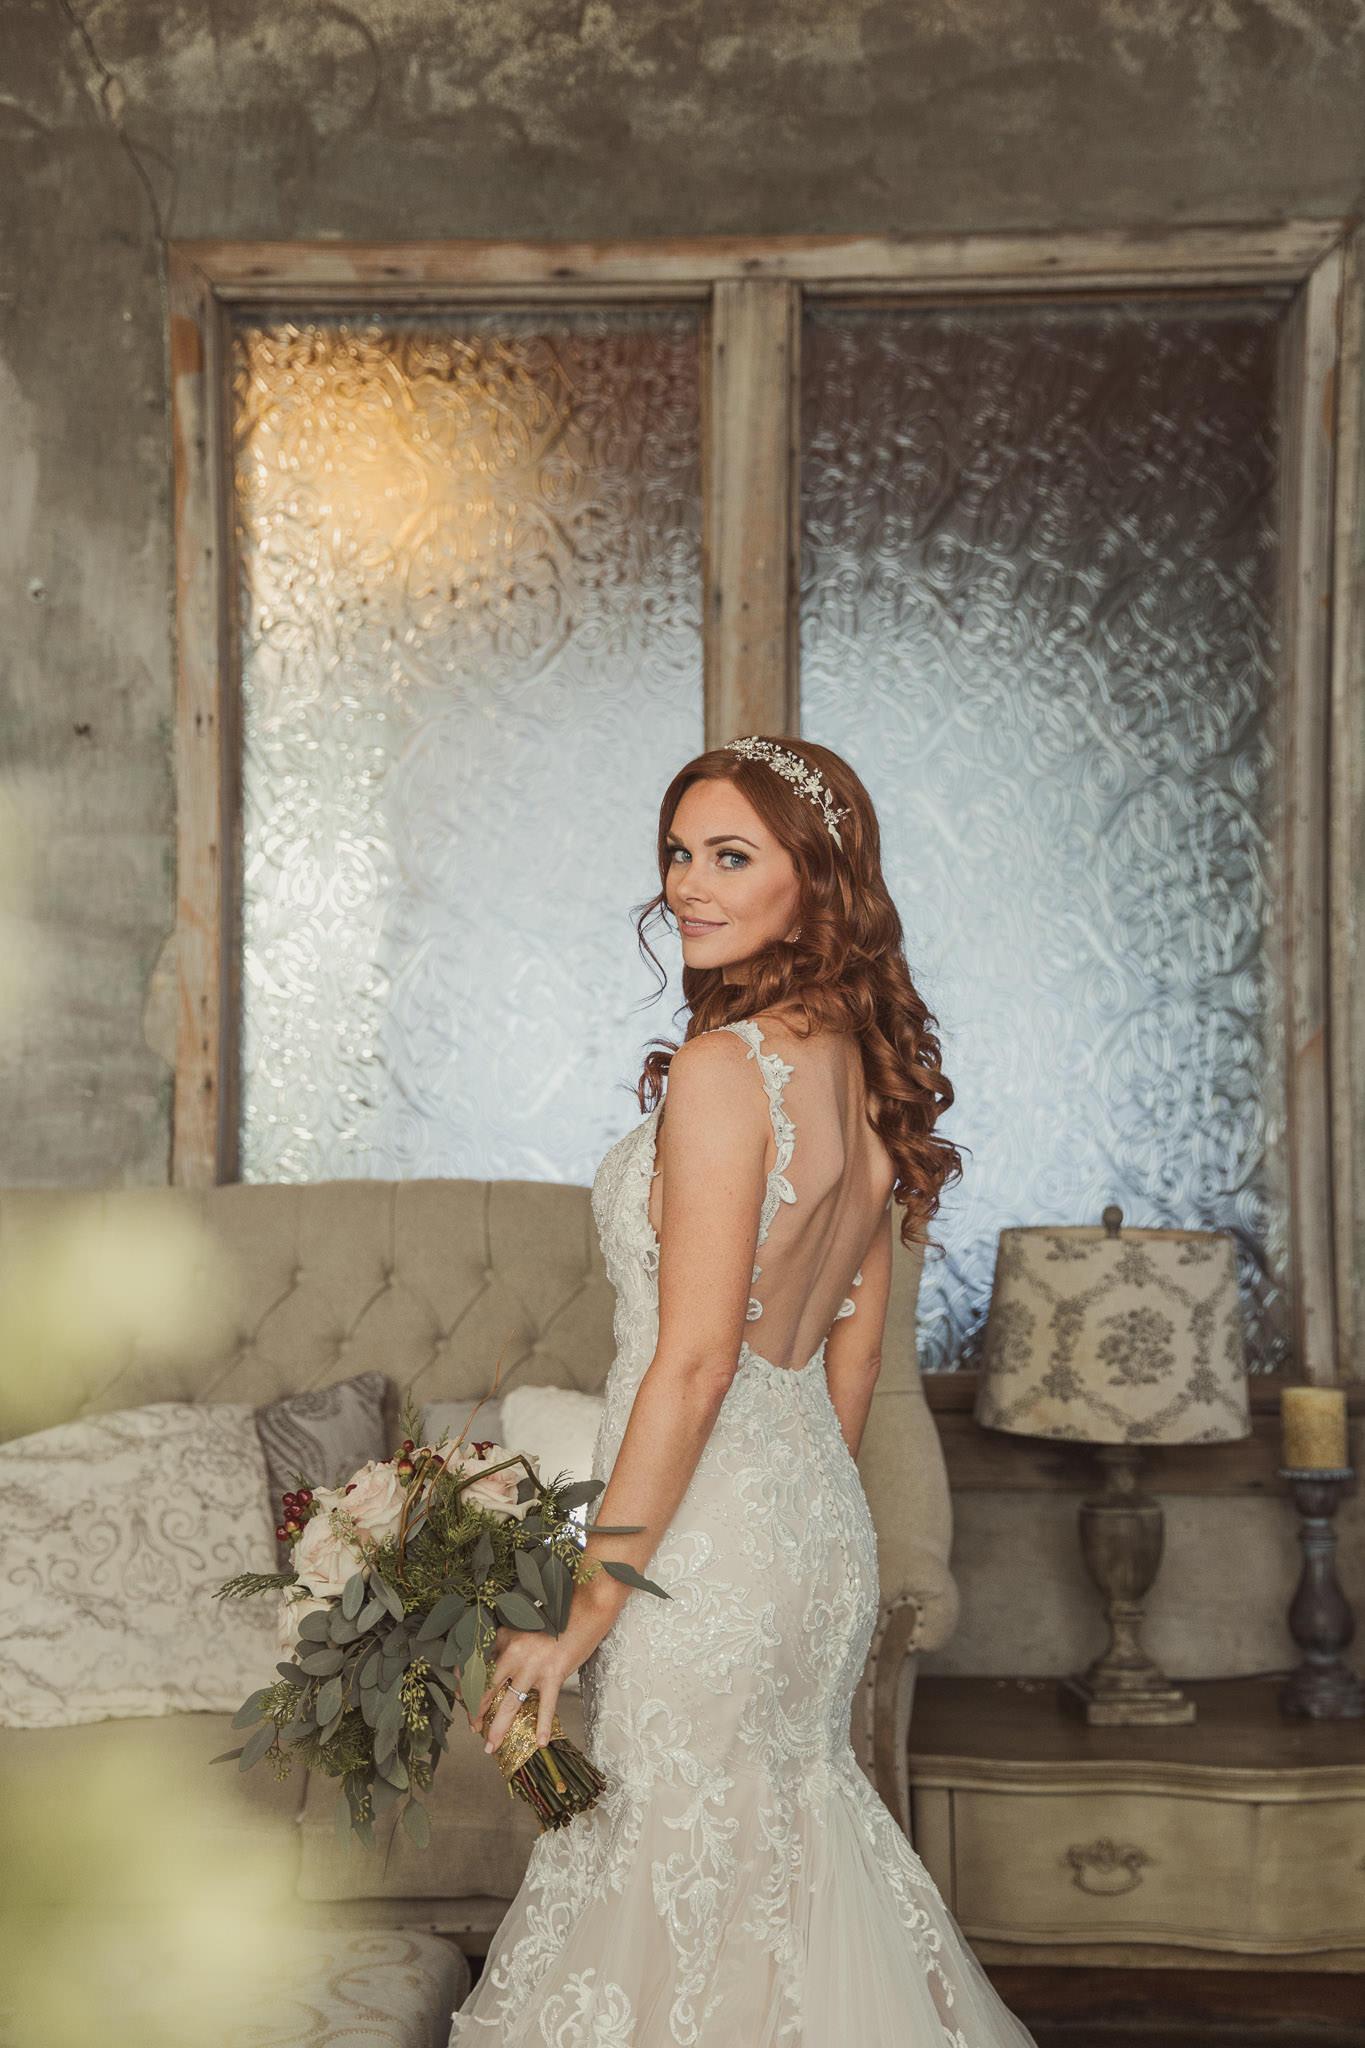 Cynthia-Curtis-Olde-Dobbine-Station-Houston-Wedding-Photographer-sm-35.jpg